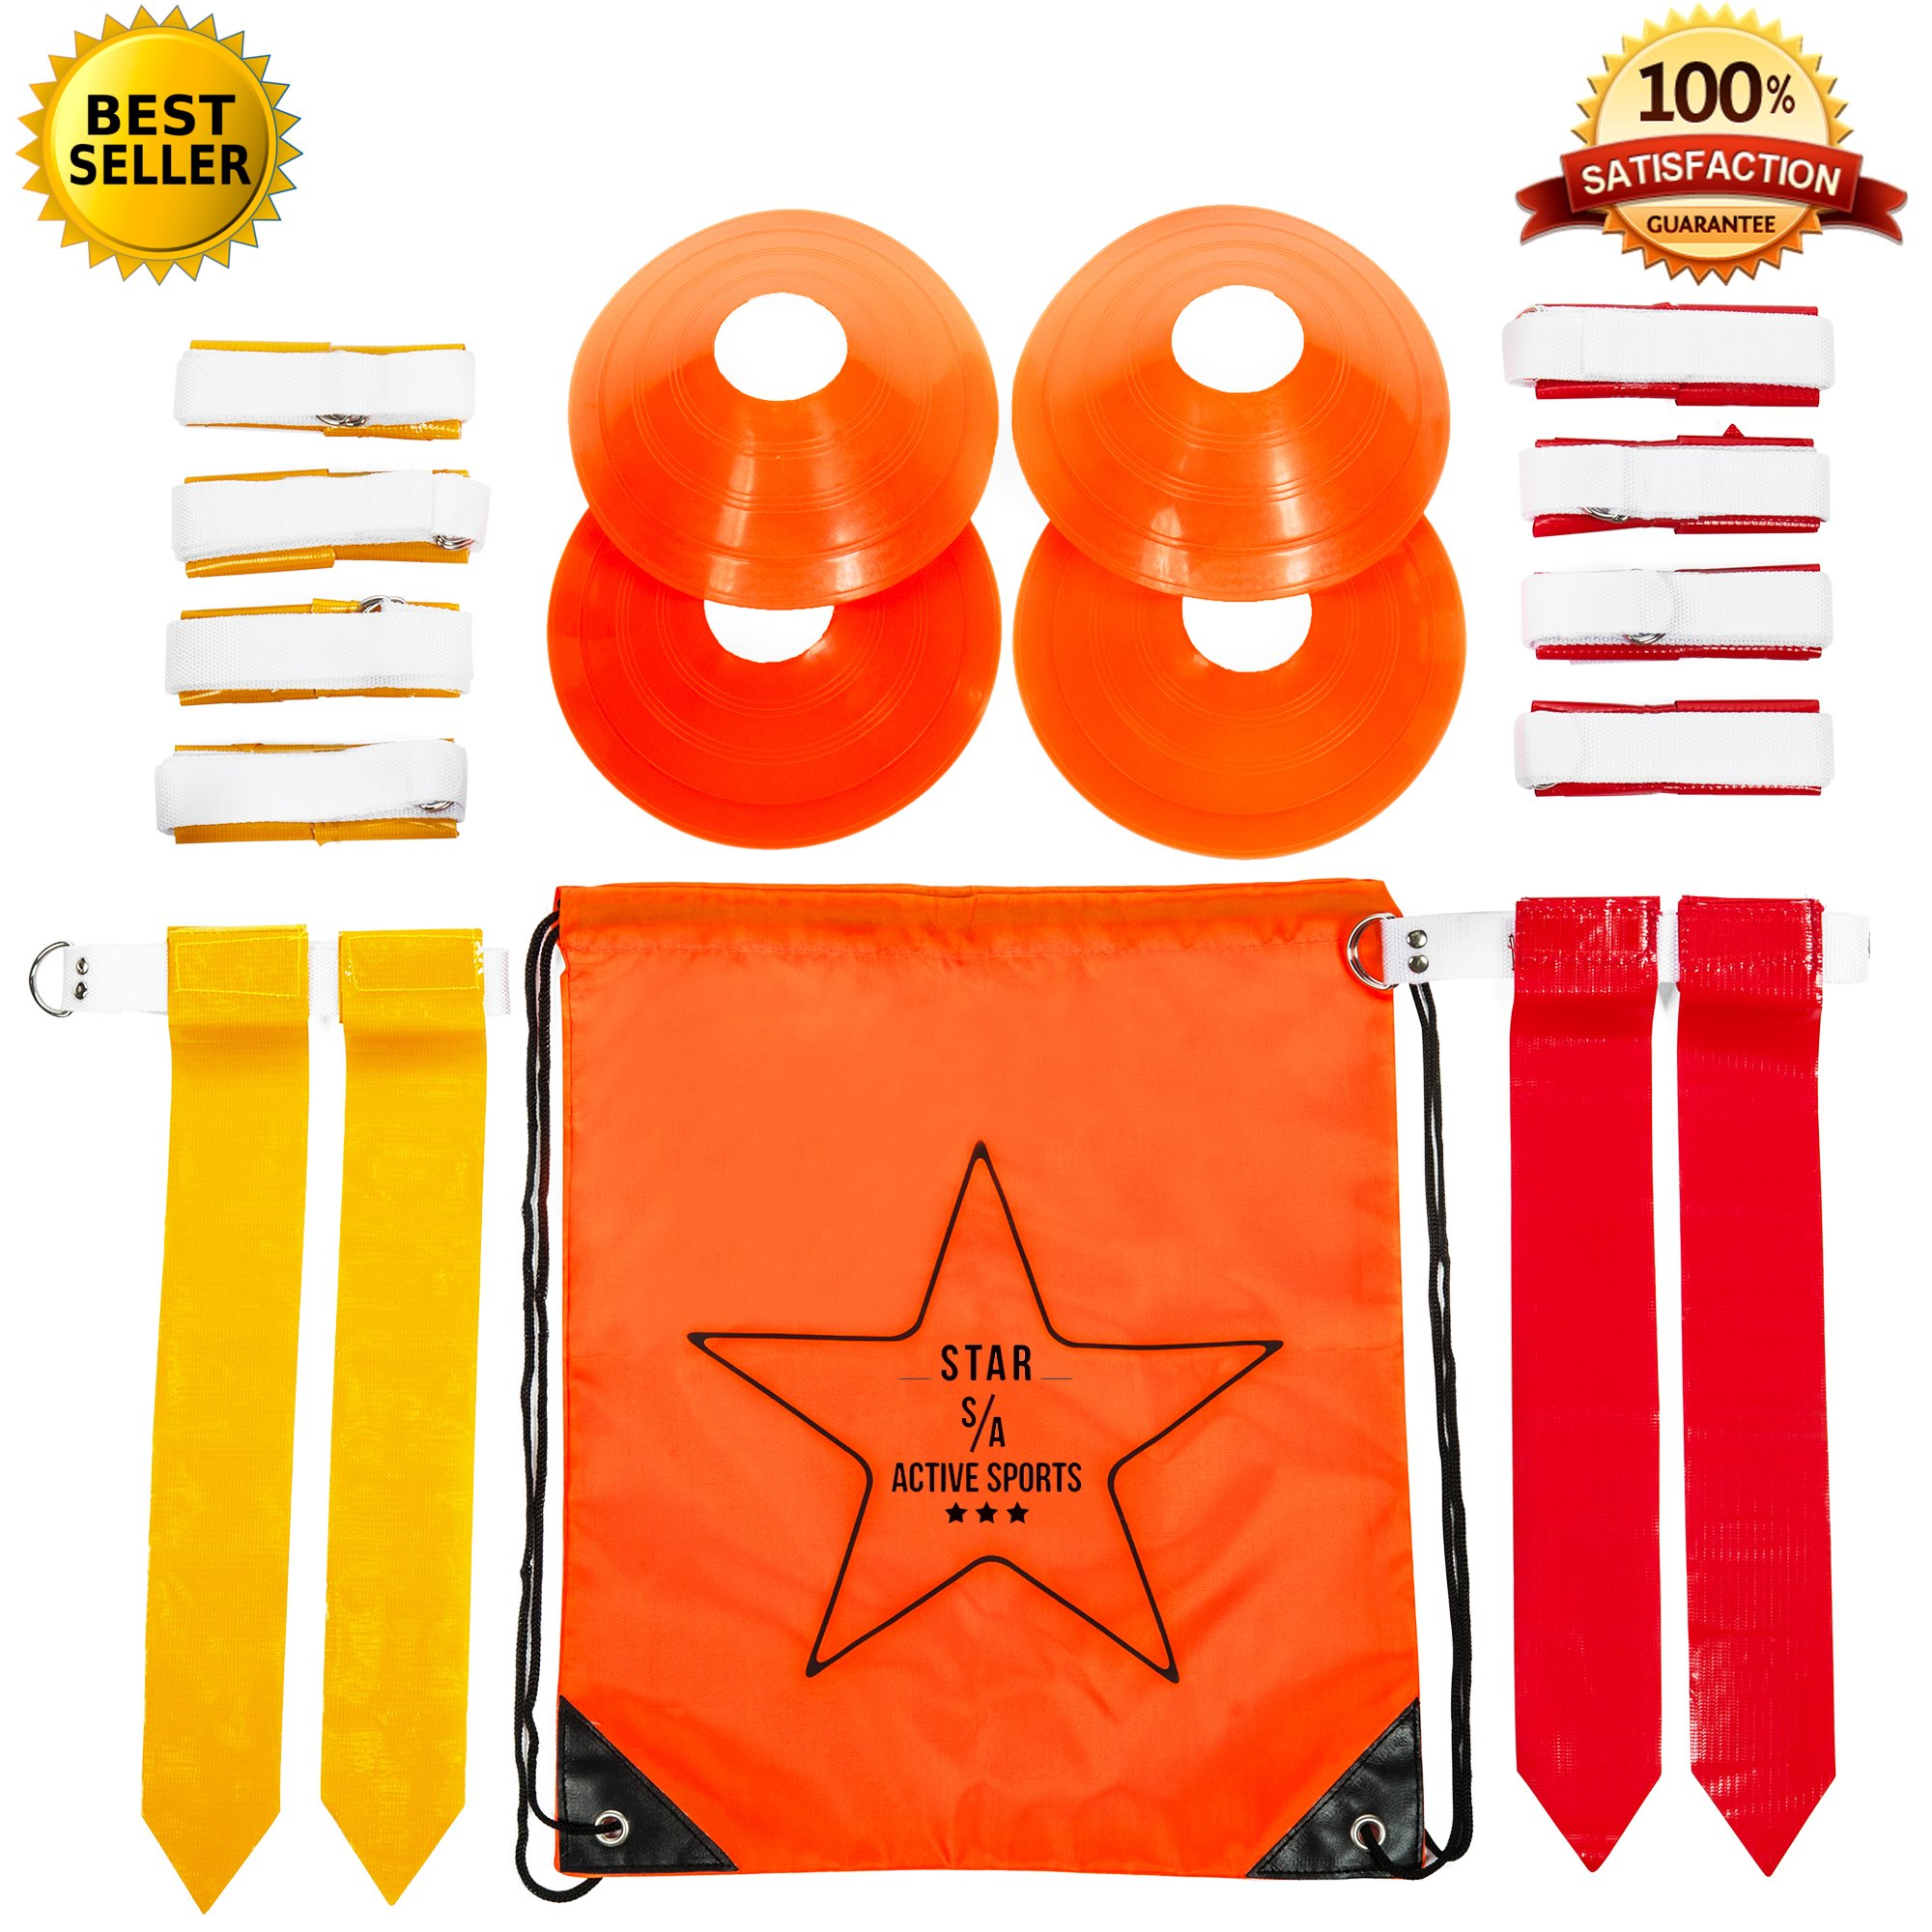 Star Active Sports Flag Football Deluxe Gear Set: Belts, Flags, Cones, Carry Bag & Bonus Flag Football Playbook (eBook)